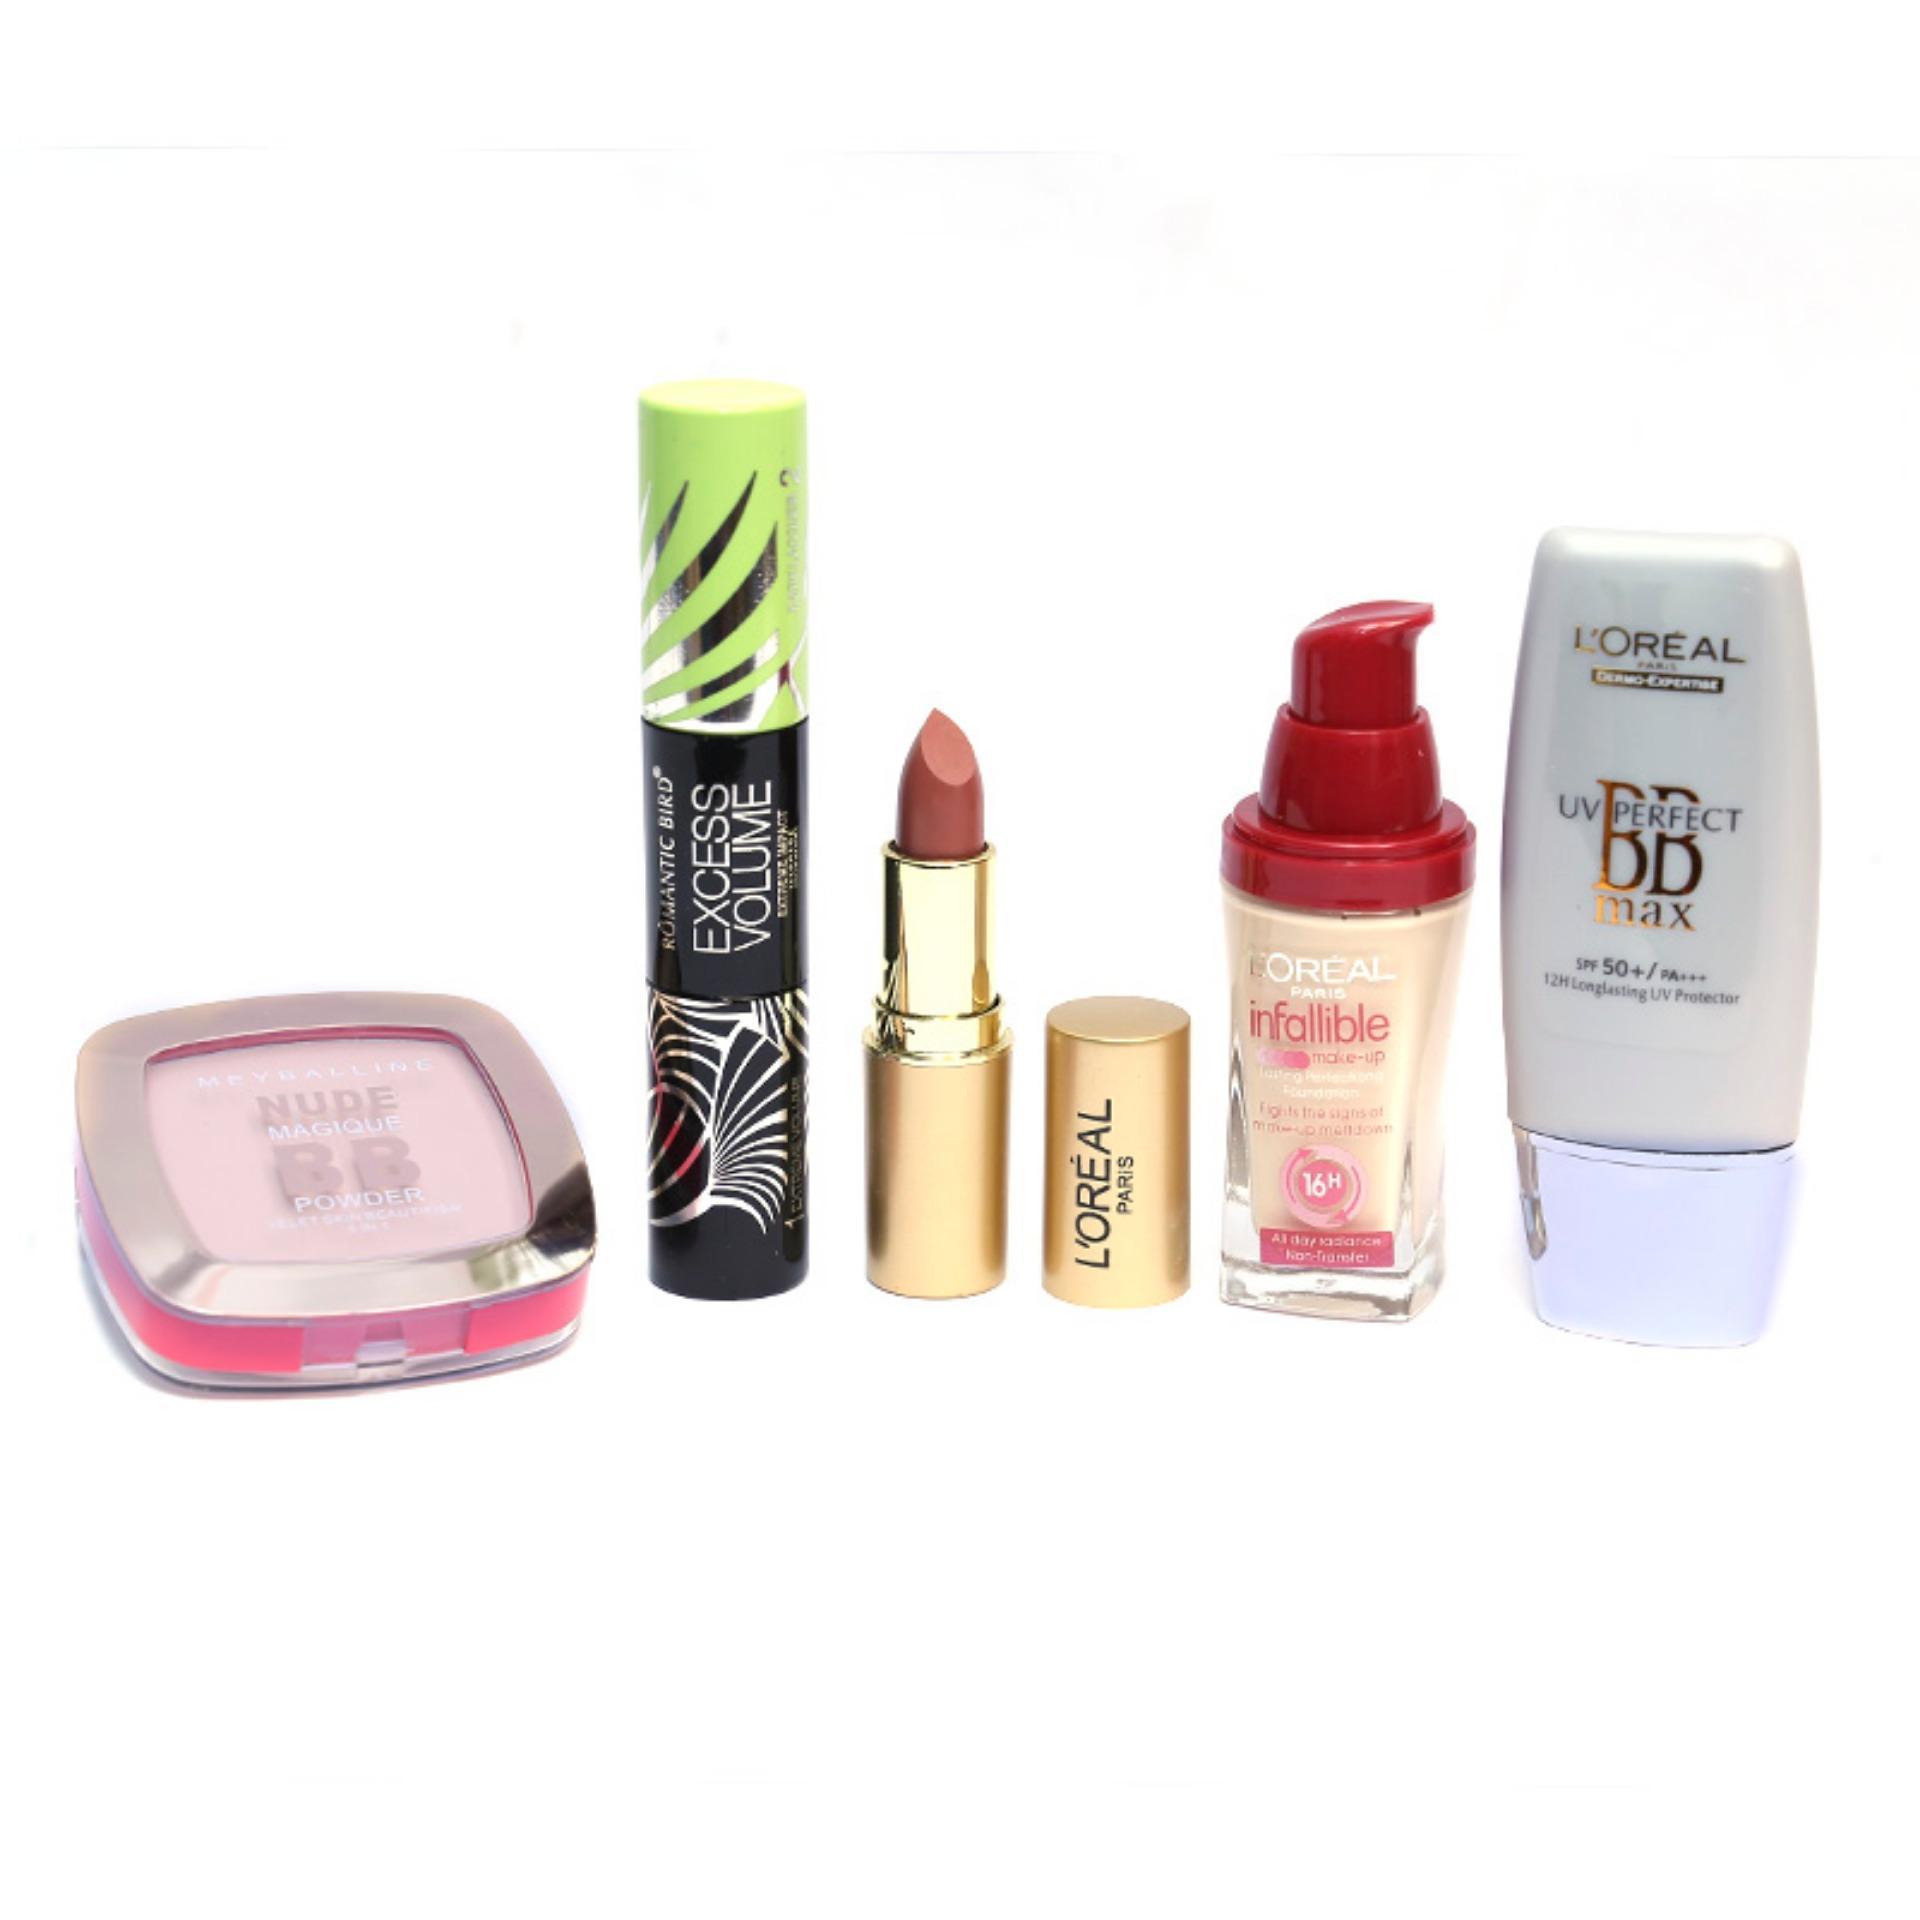 Exclusive Cosmetic Pack Of 5: 1 Loreal Paris BB Cream + 1 Loreal Paris Lasting